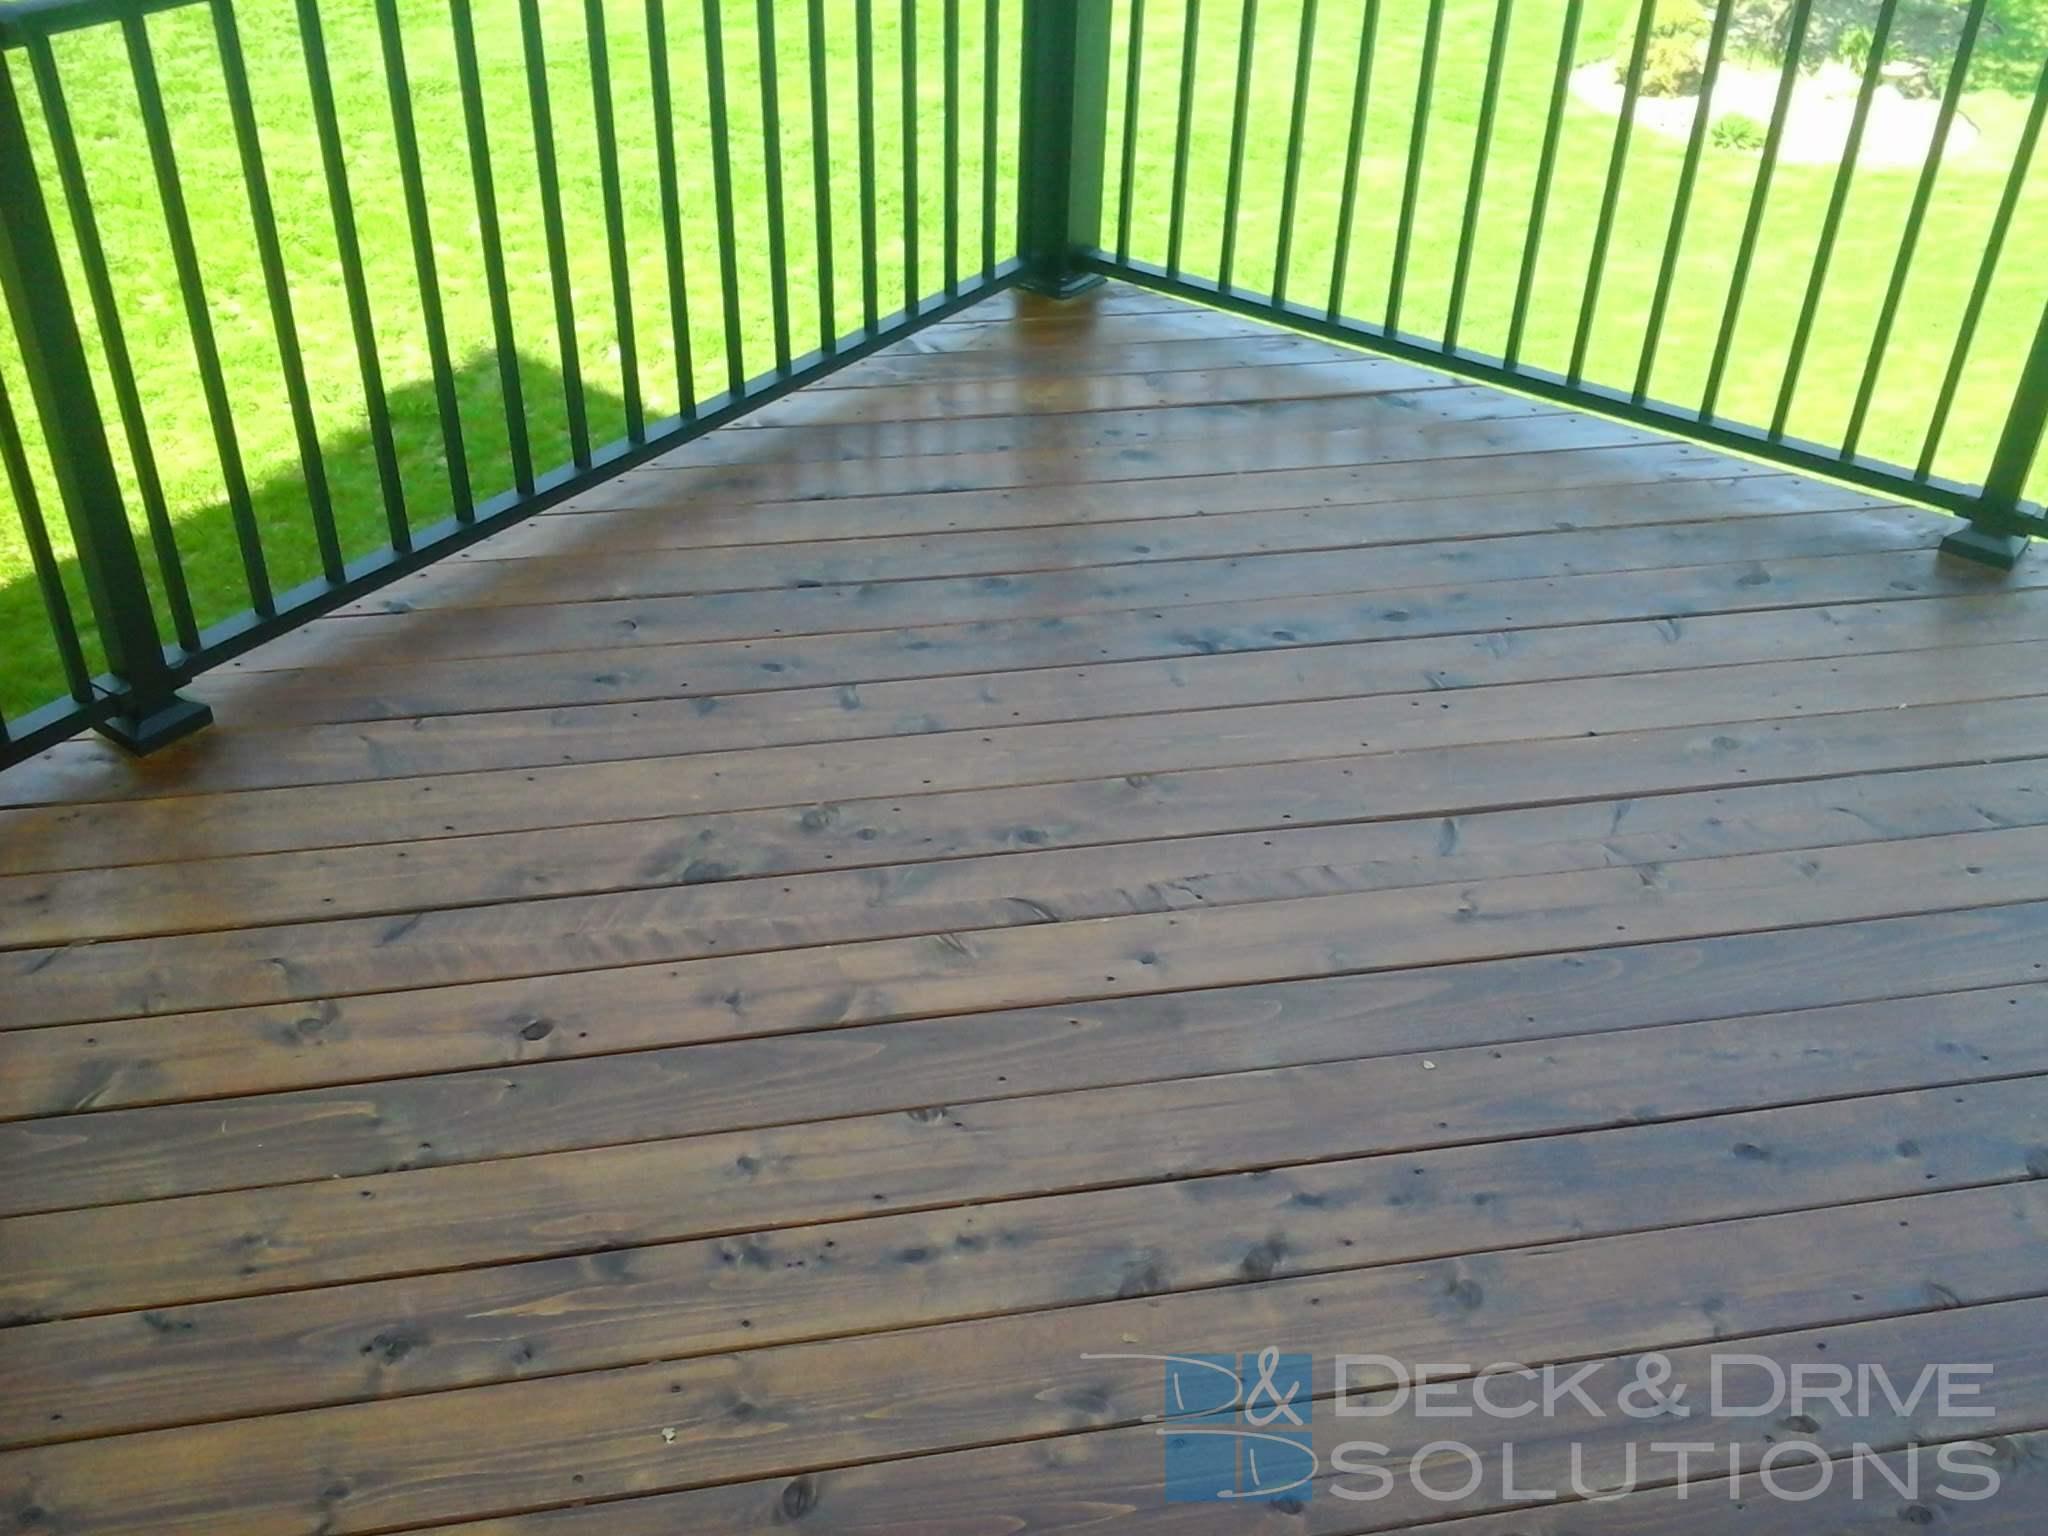 Mission Brown Penofin On New Cedar Deck Des Moines Deck